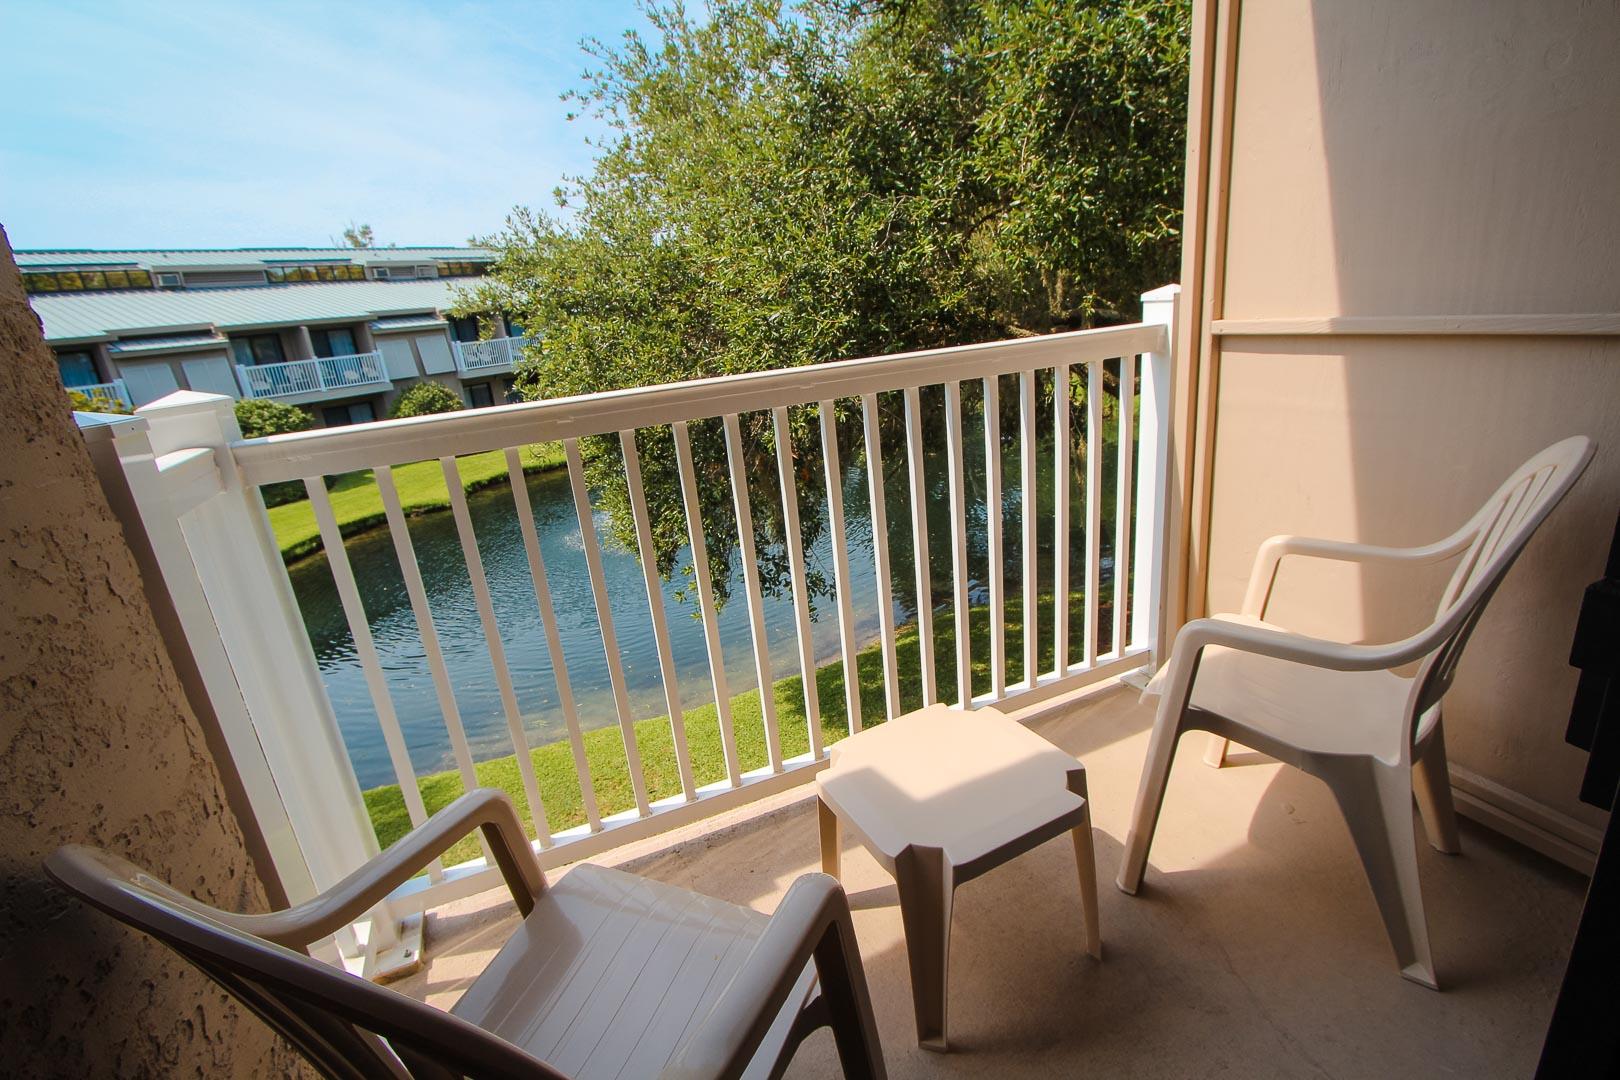 A peaceful balcony view at VRI's Players Club Resort in Hilton Head Island, South Carolina.